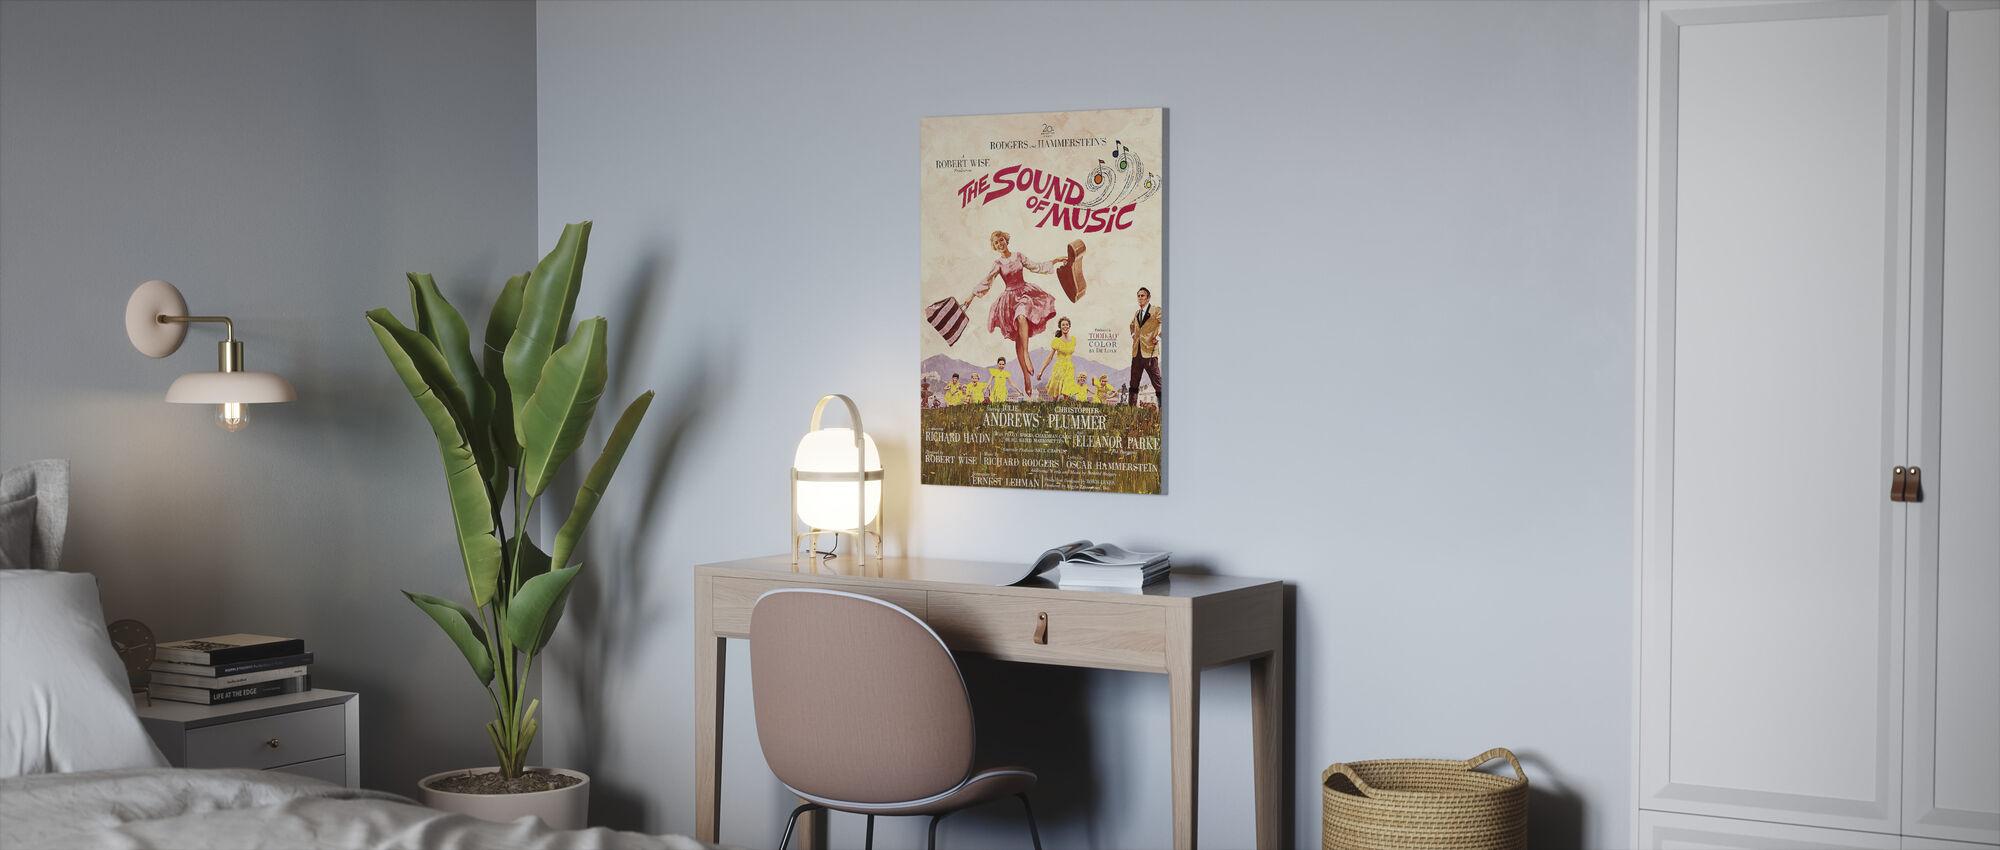 Geluid van muziek - Canvas print - Kantoor